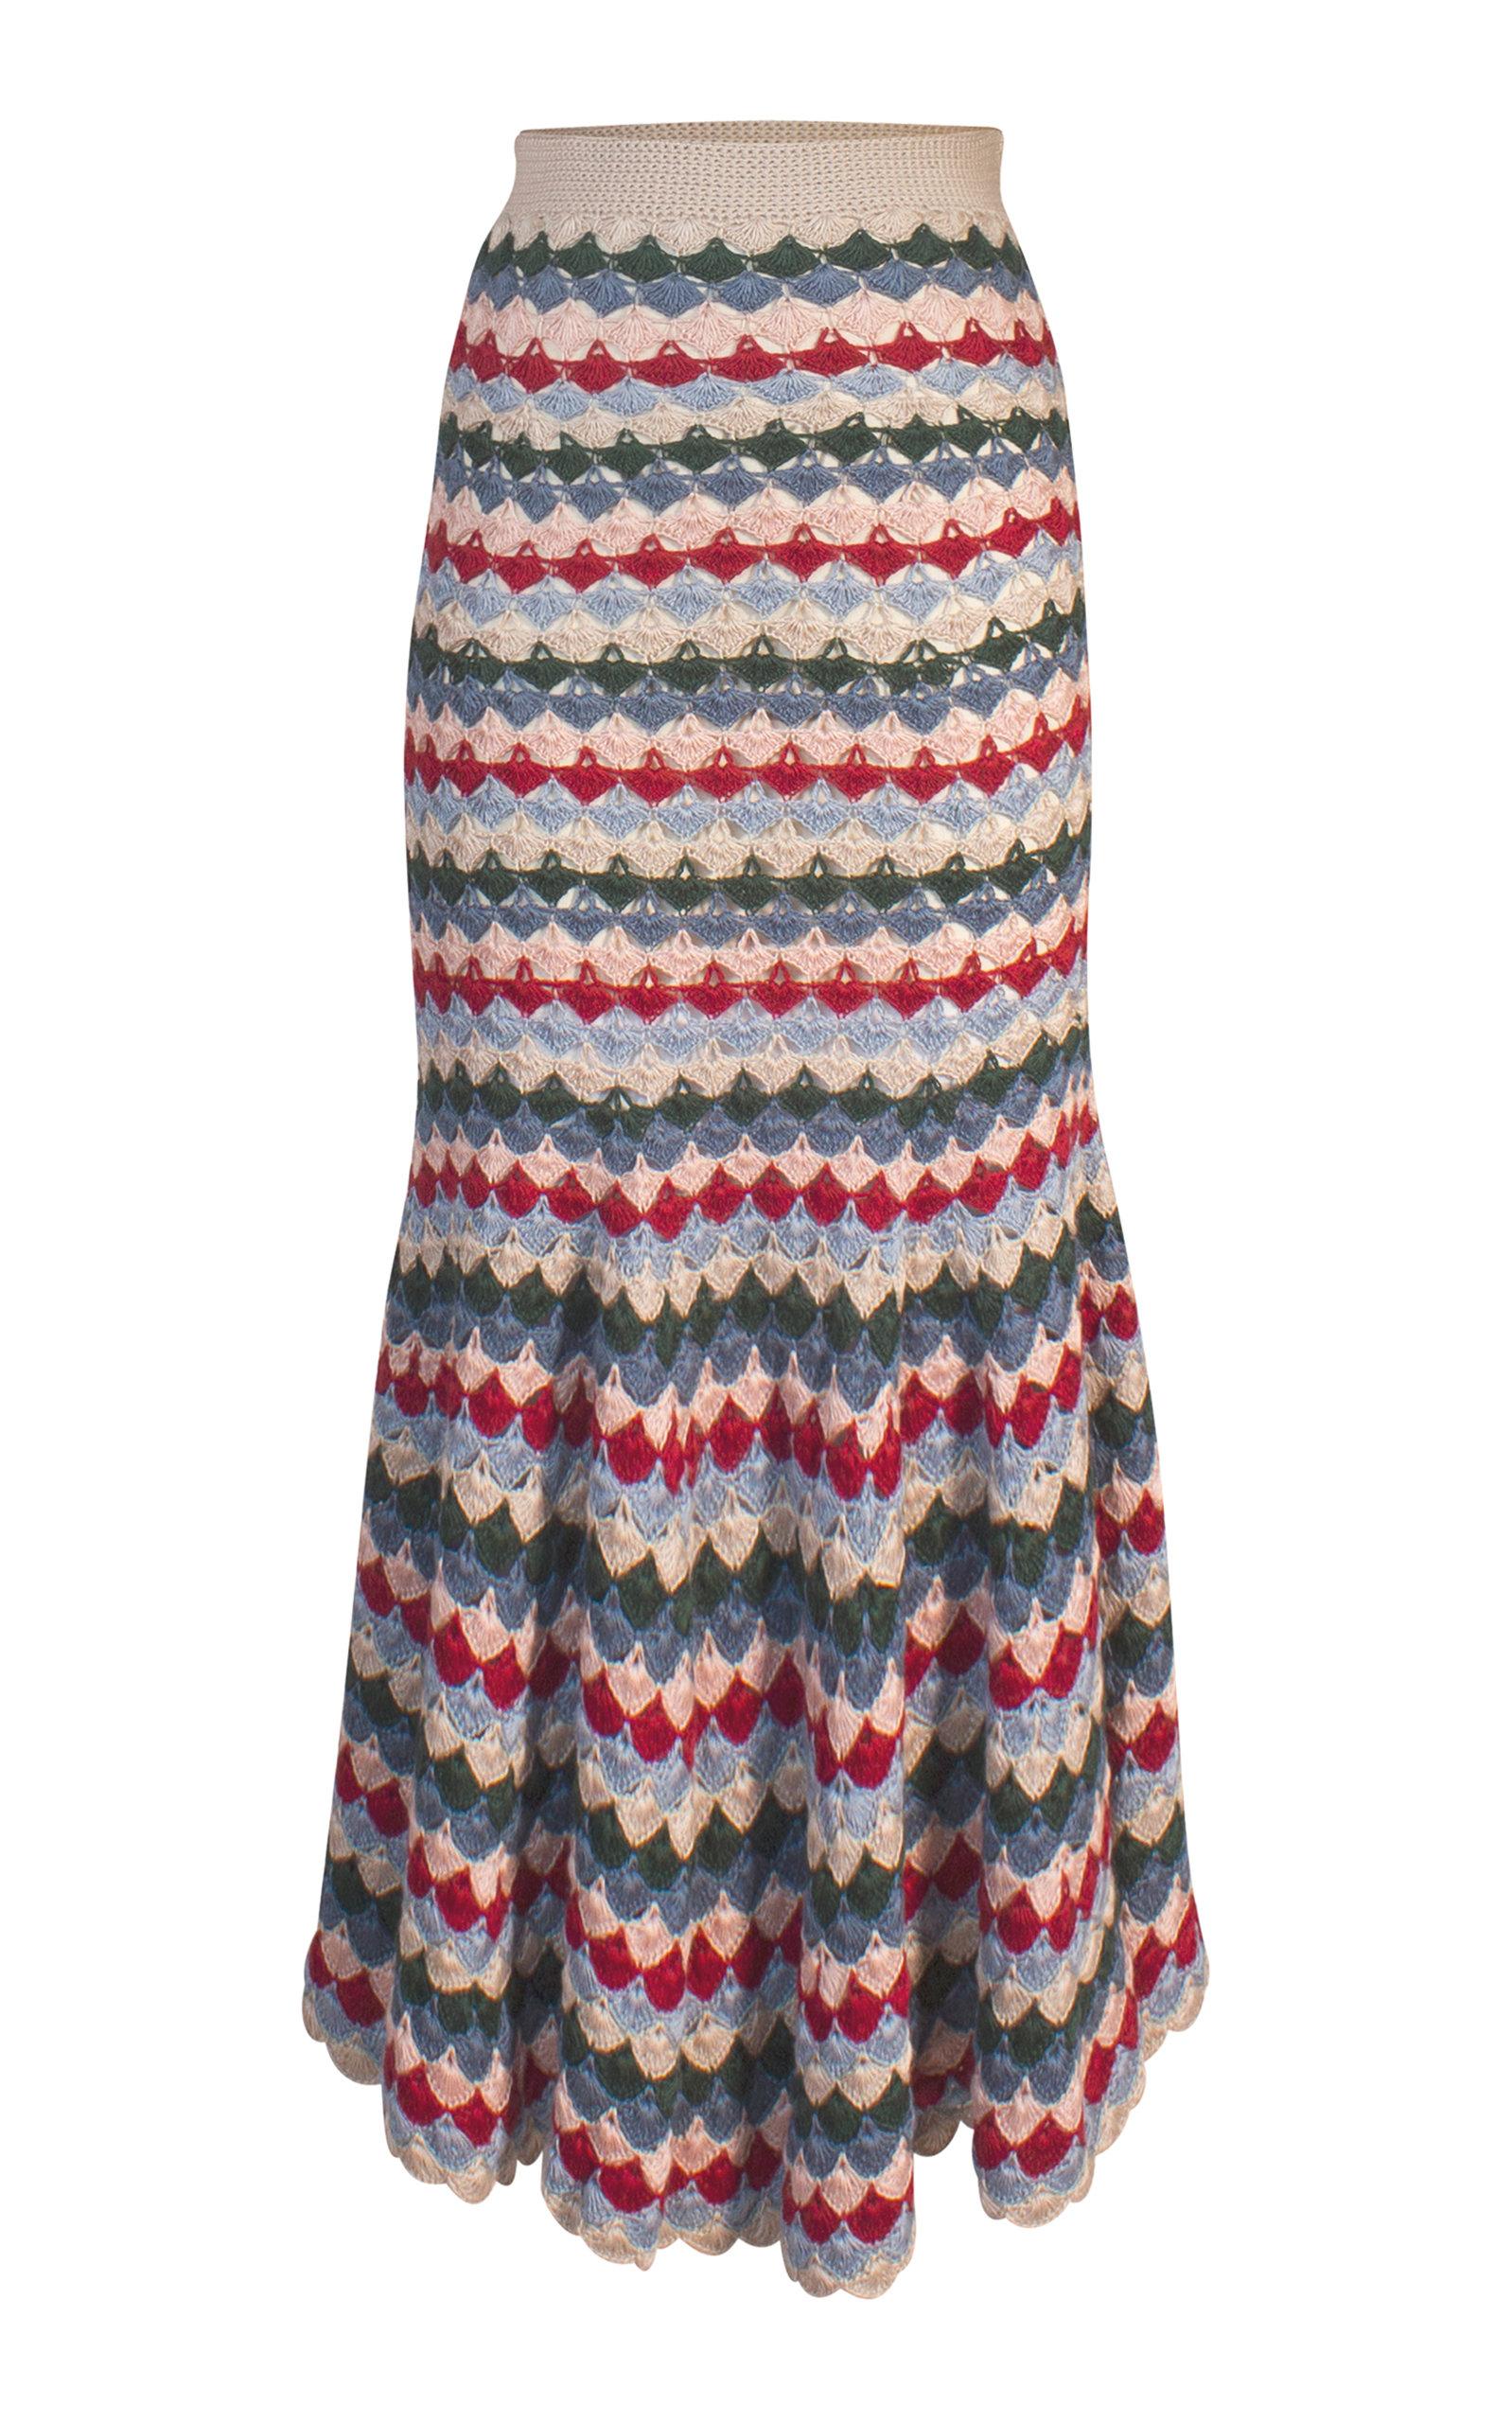 ALEJANDRA ALONSO ROJAS Jimena Crochet Skirt in Multi